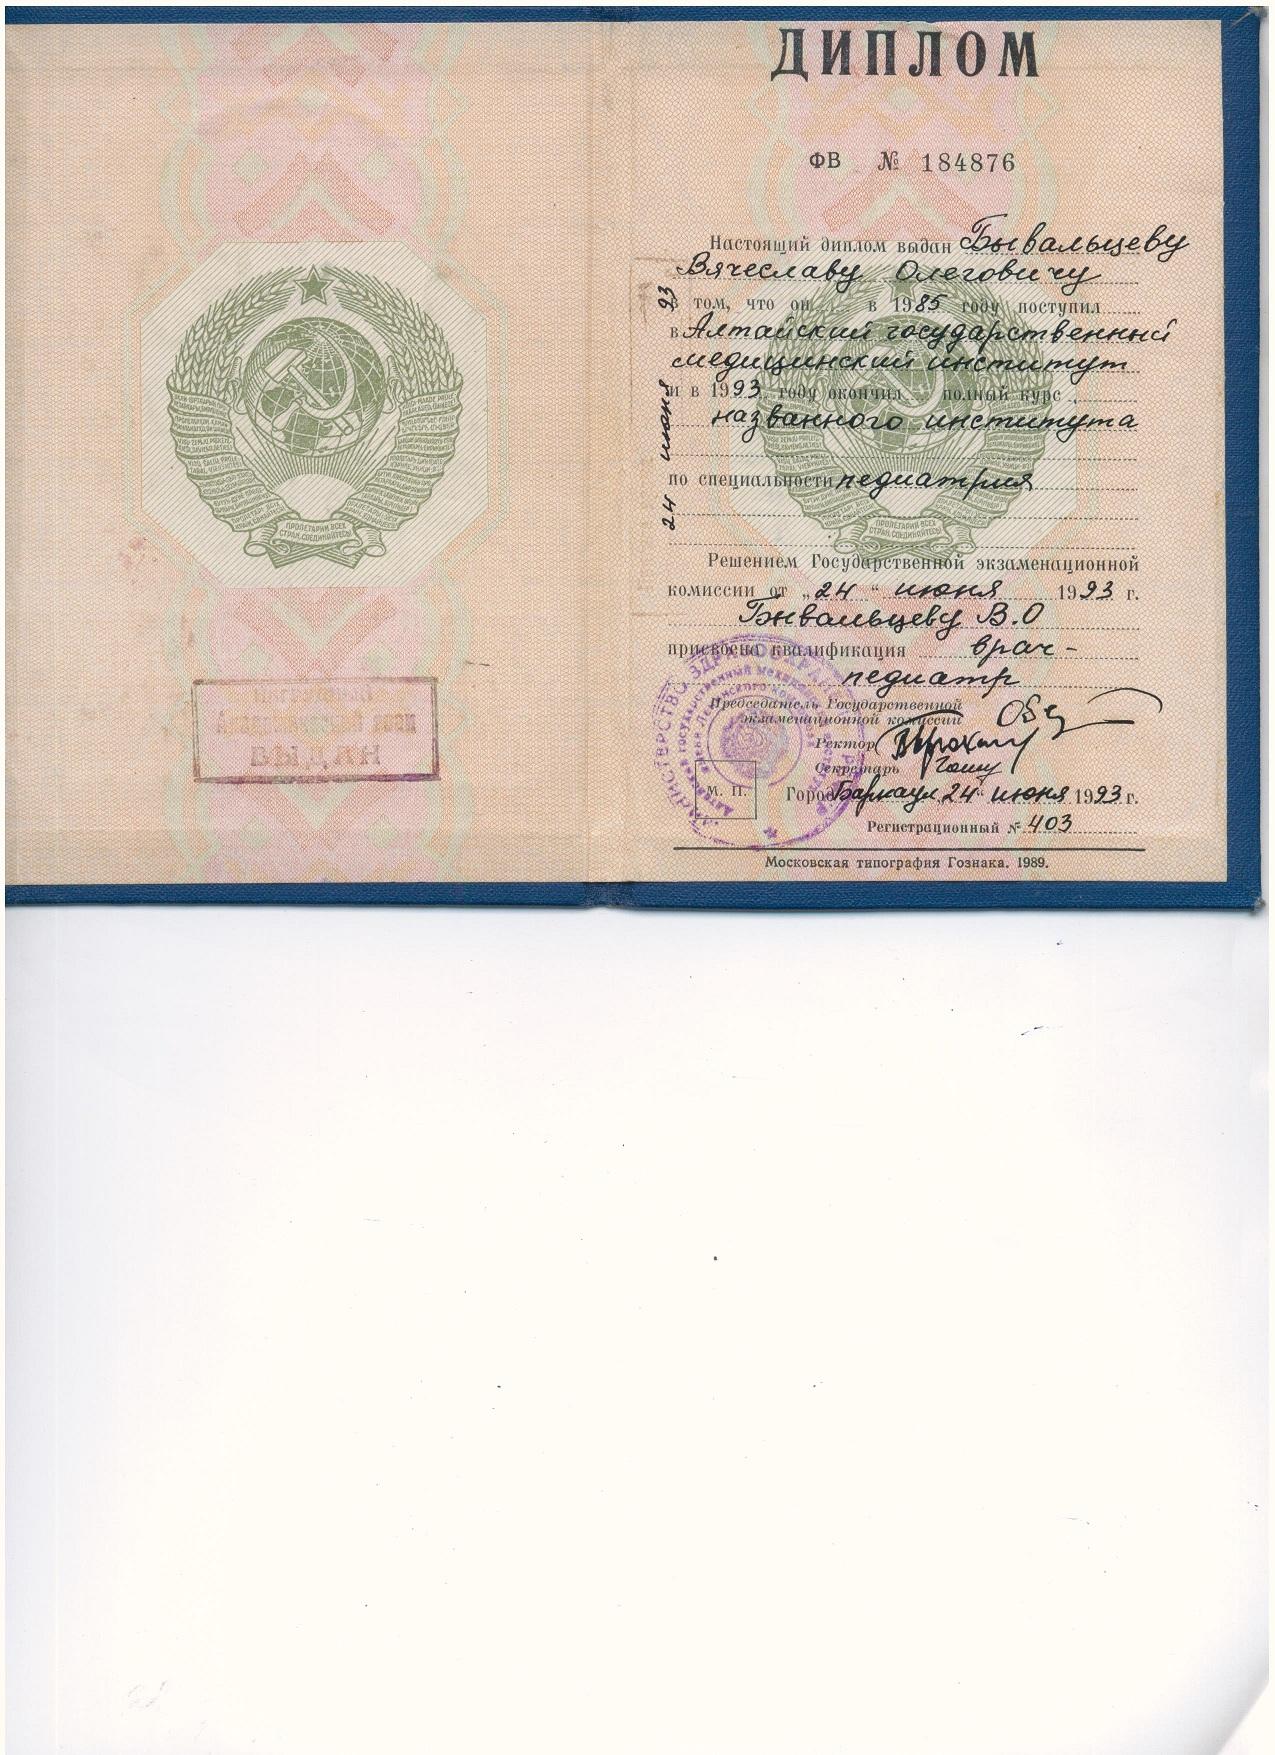 1993 Диплом_АГМИ Педиатрия